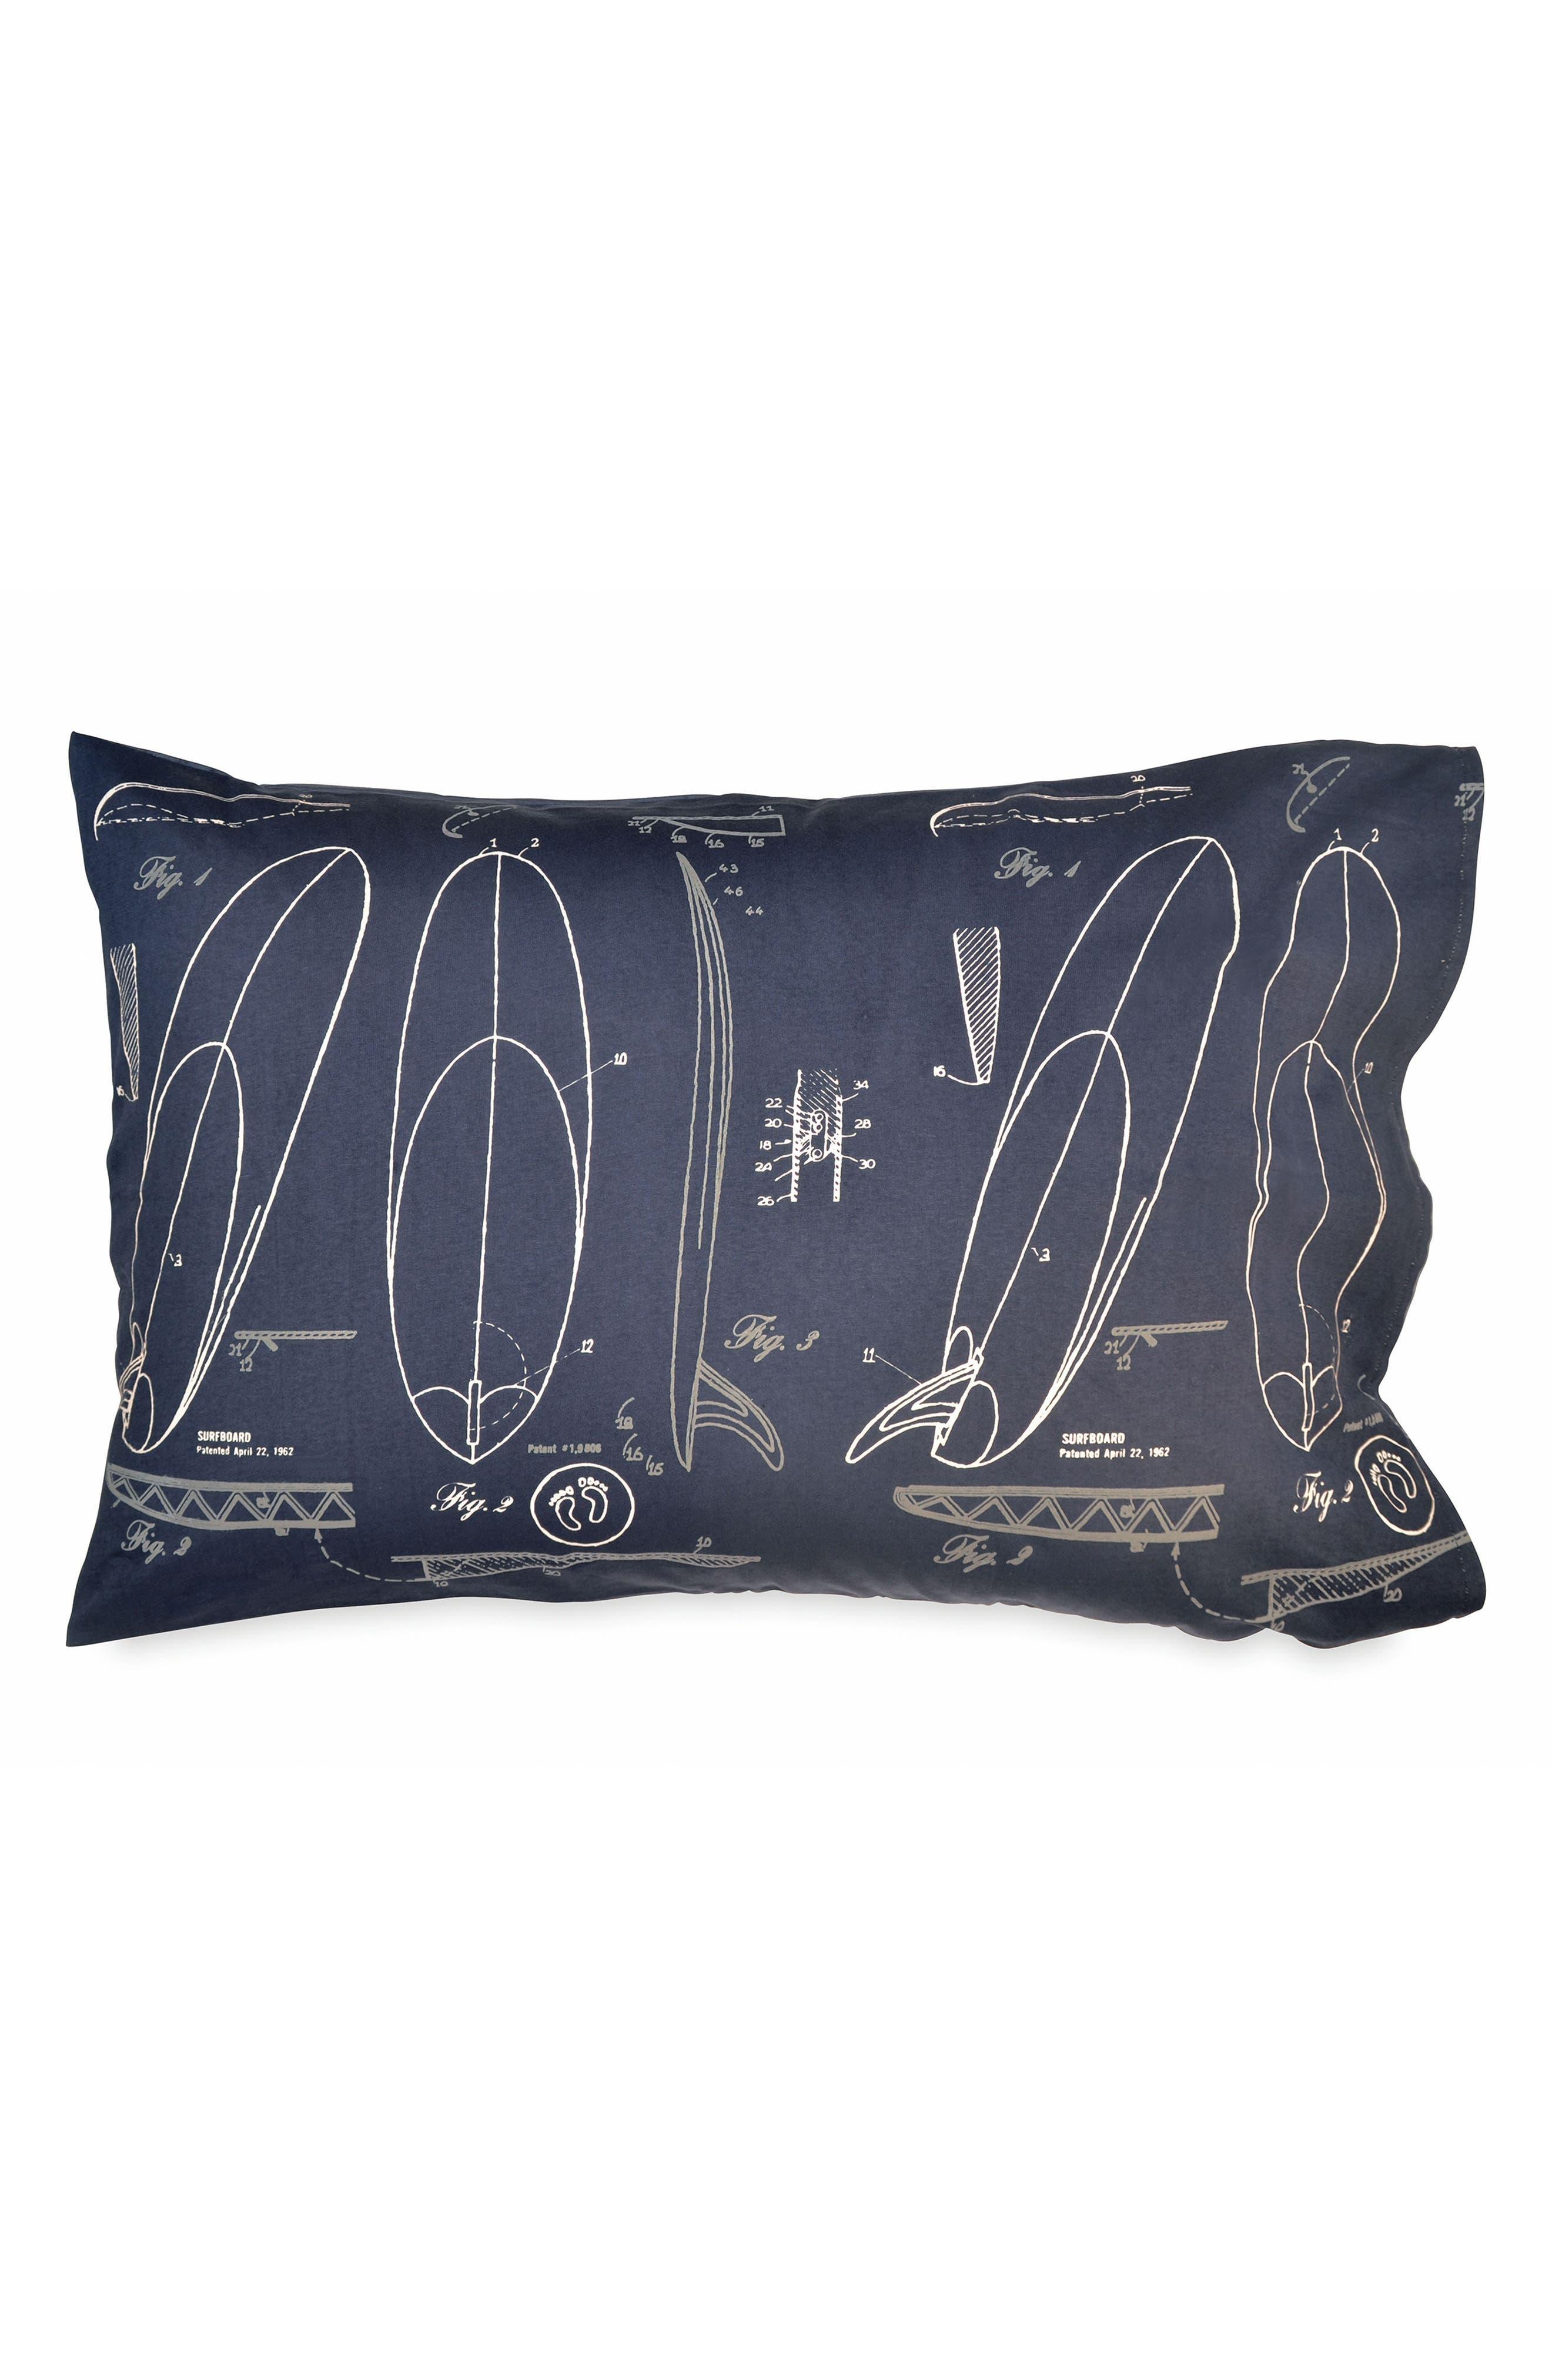 Surfer Sketch Pillowcase,                         Main,                         color, 040